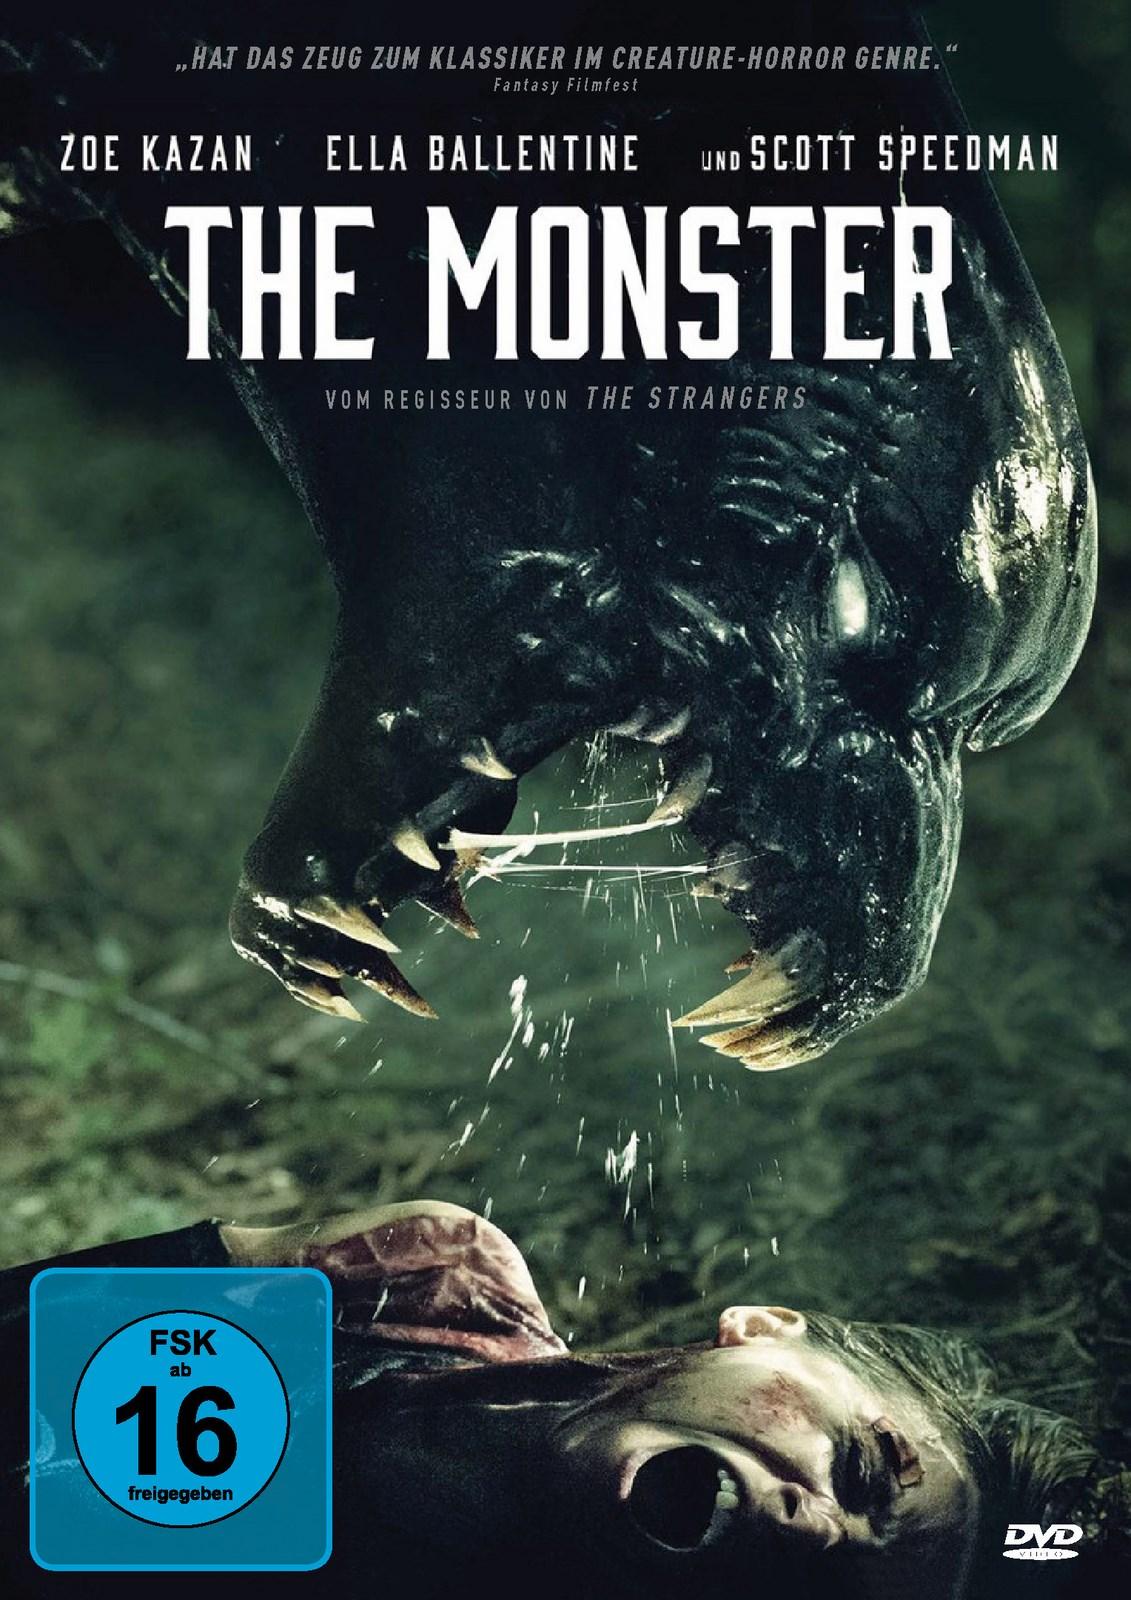 The Monster - Film 2016 - FILMSTARTS.de